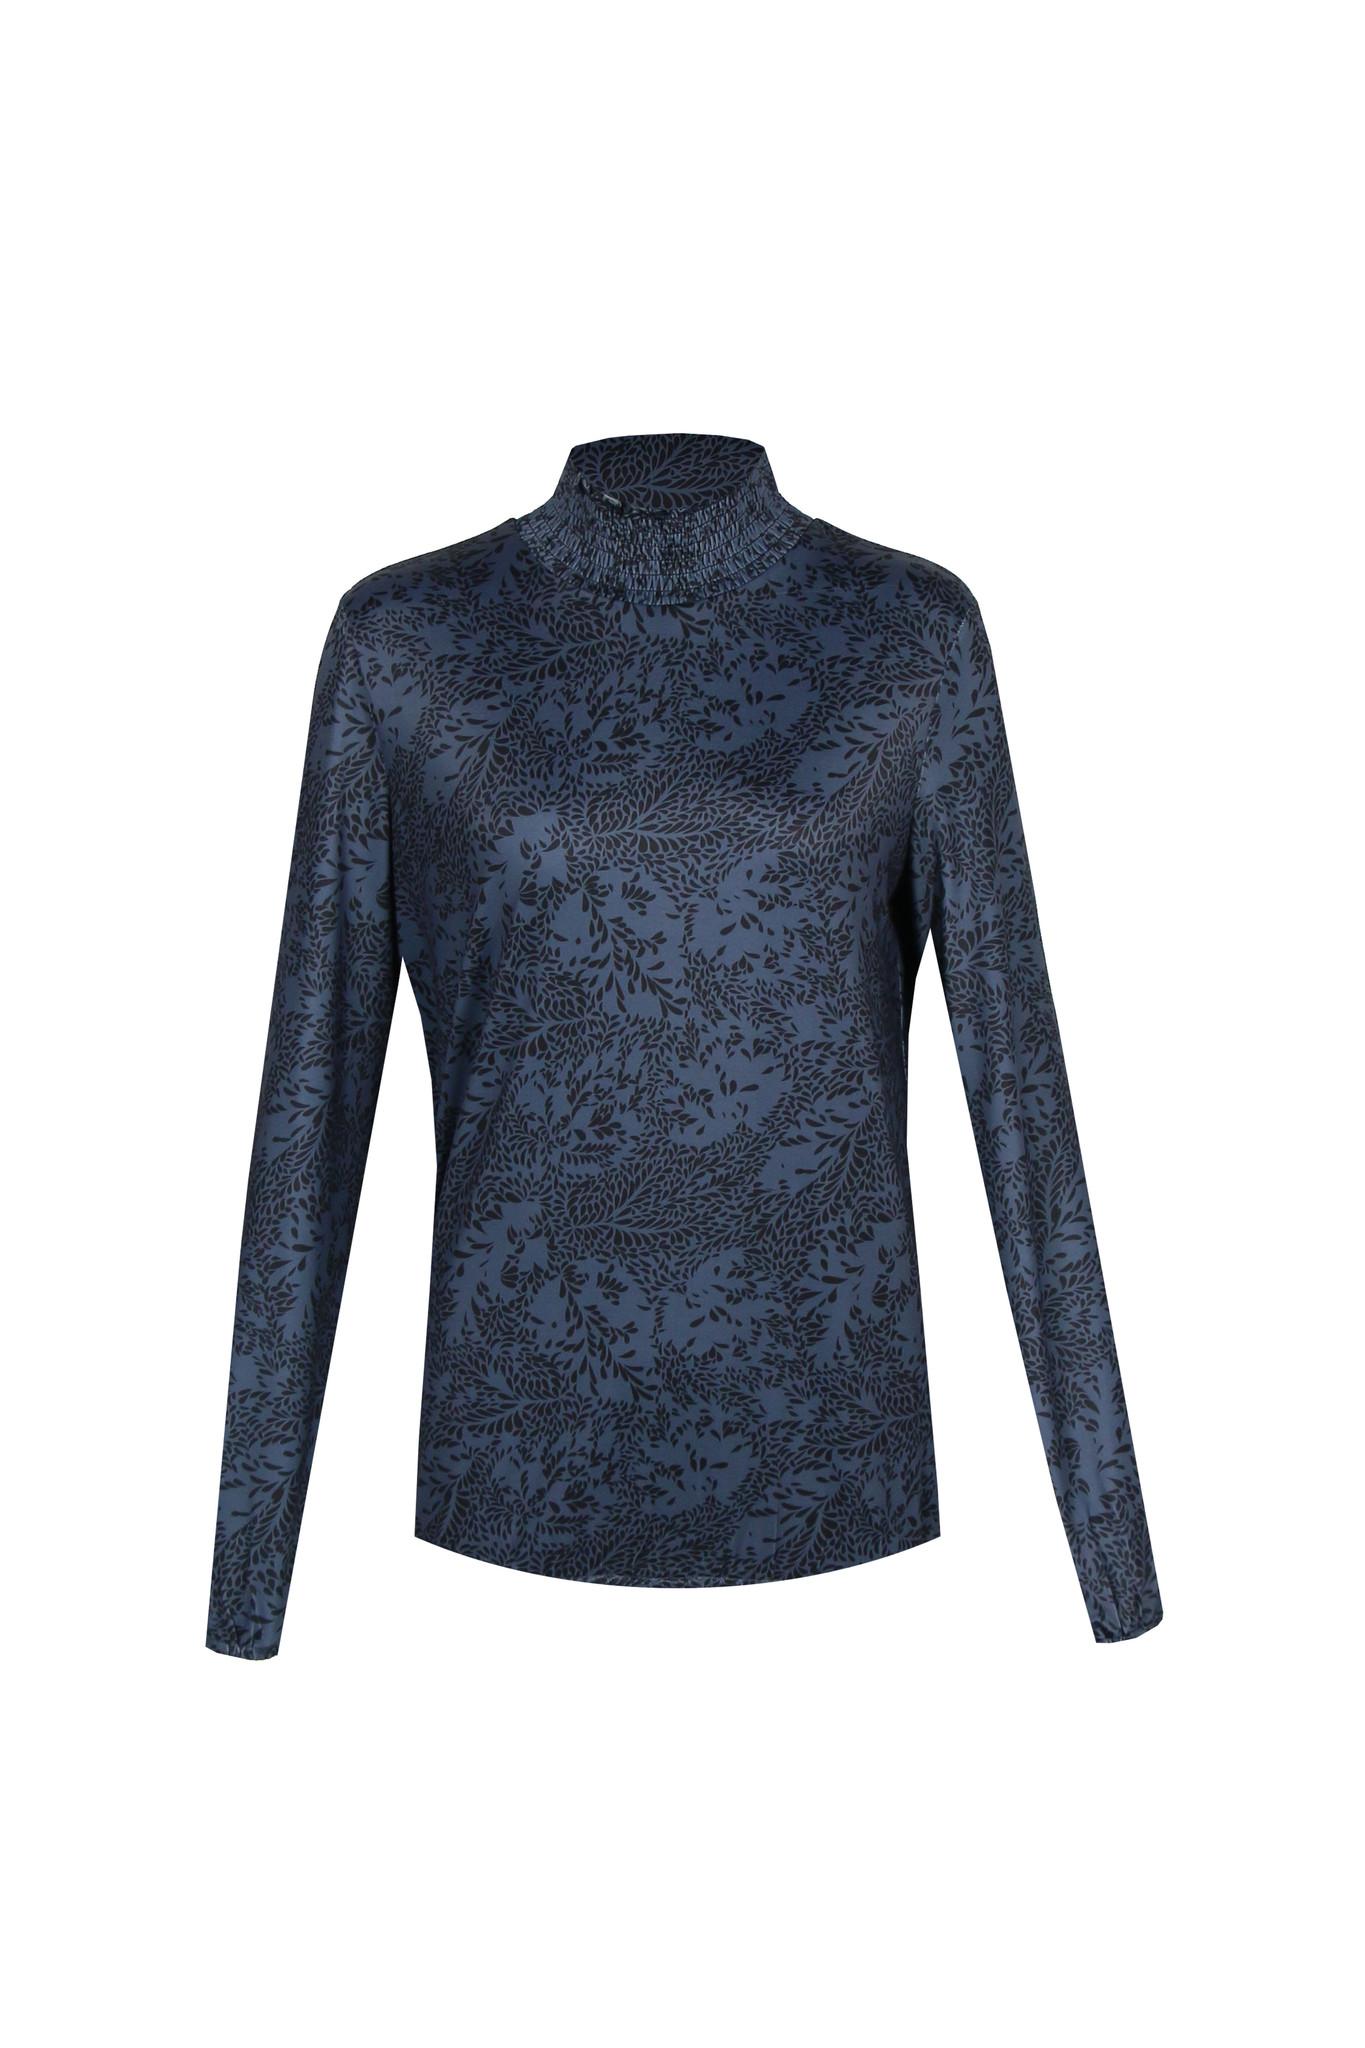 G-Maxx G-Maxx Katoo longsleeve jeansblauw/zwart